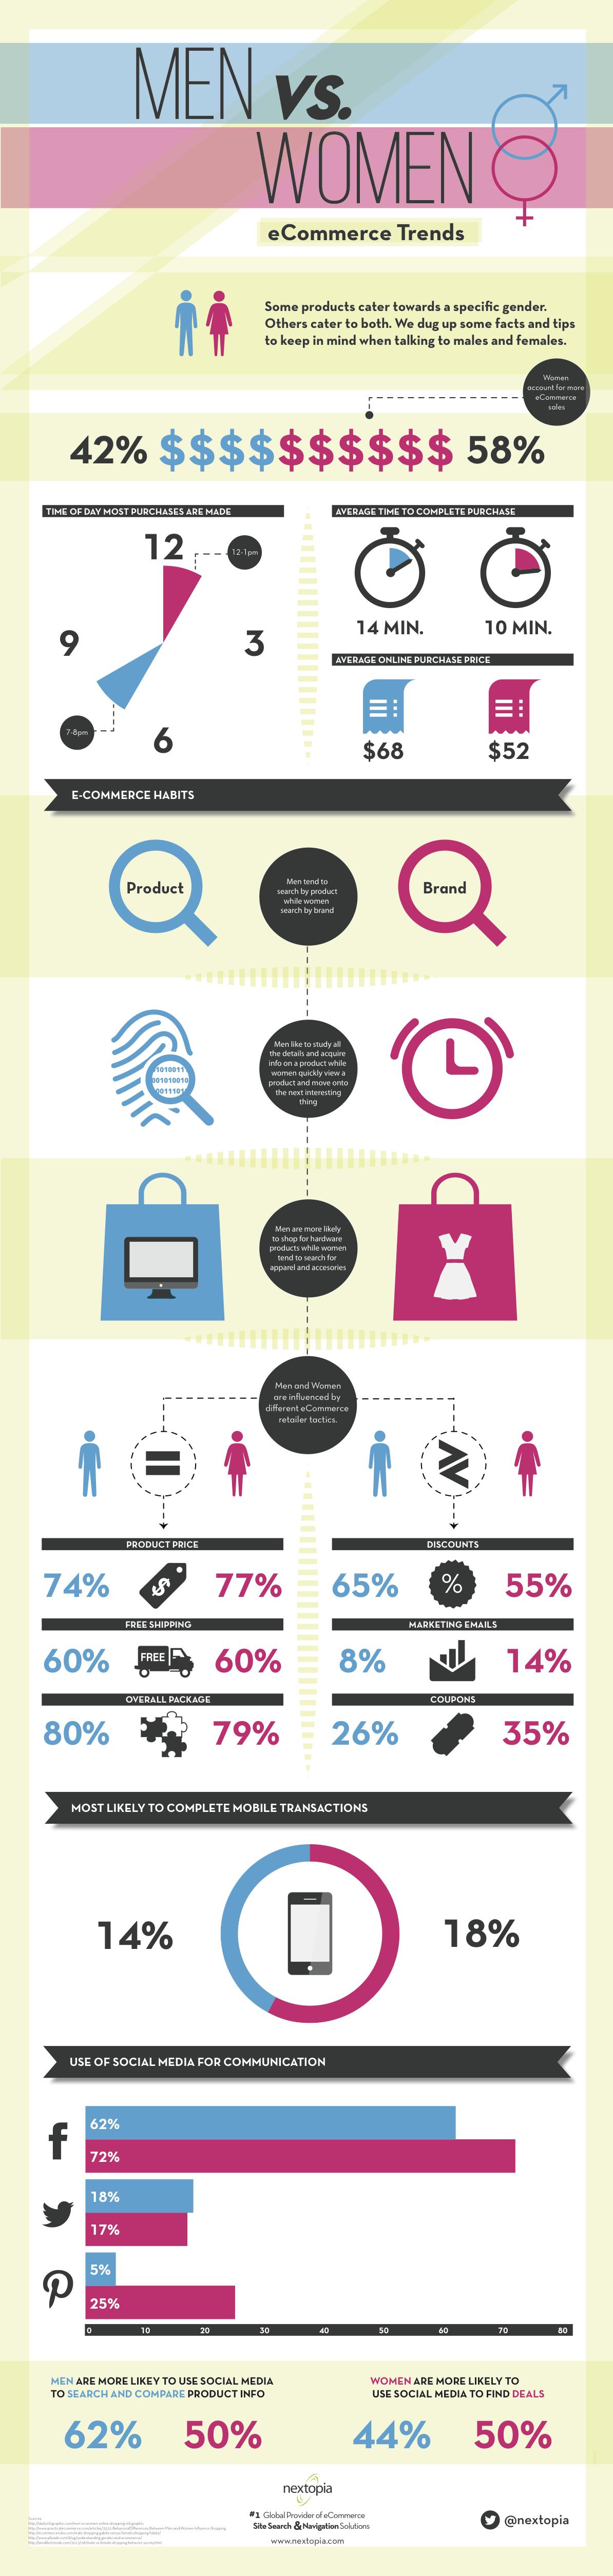 Men Vs Women Ecommerce Trends  Consumer - Demographics -3298